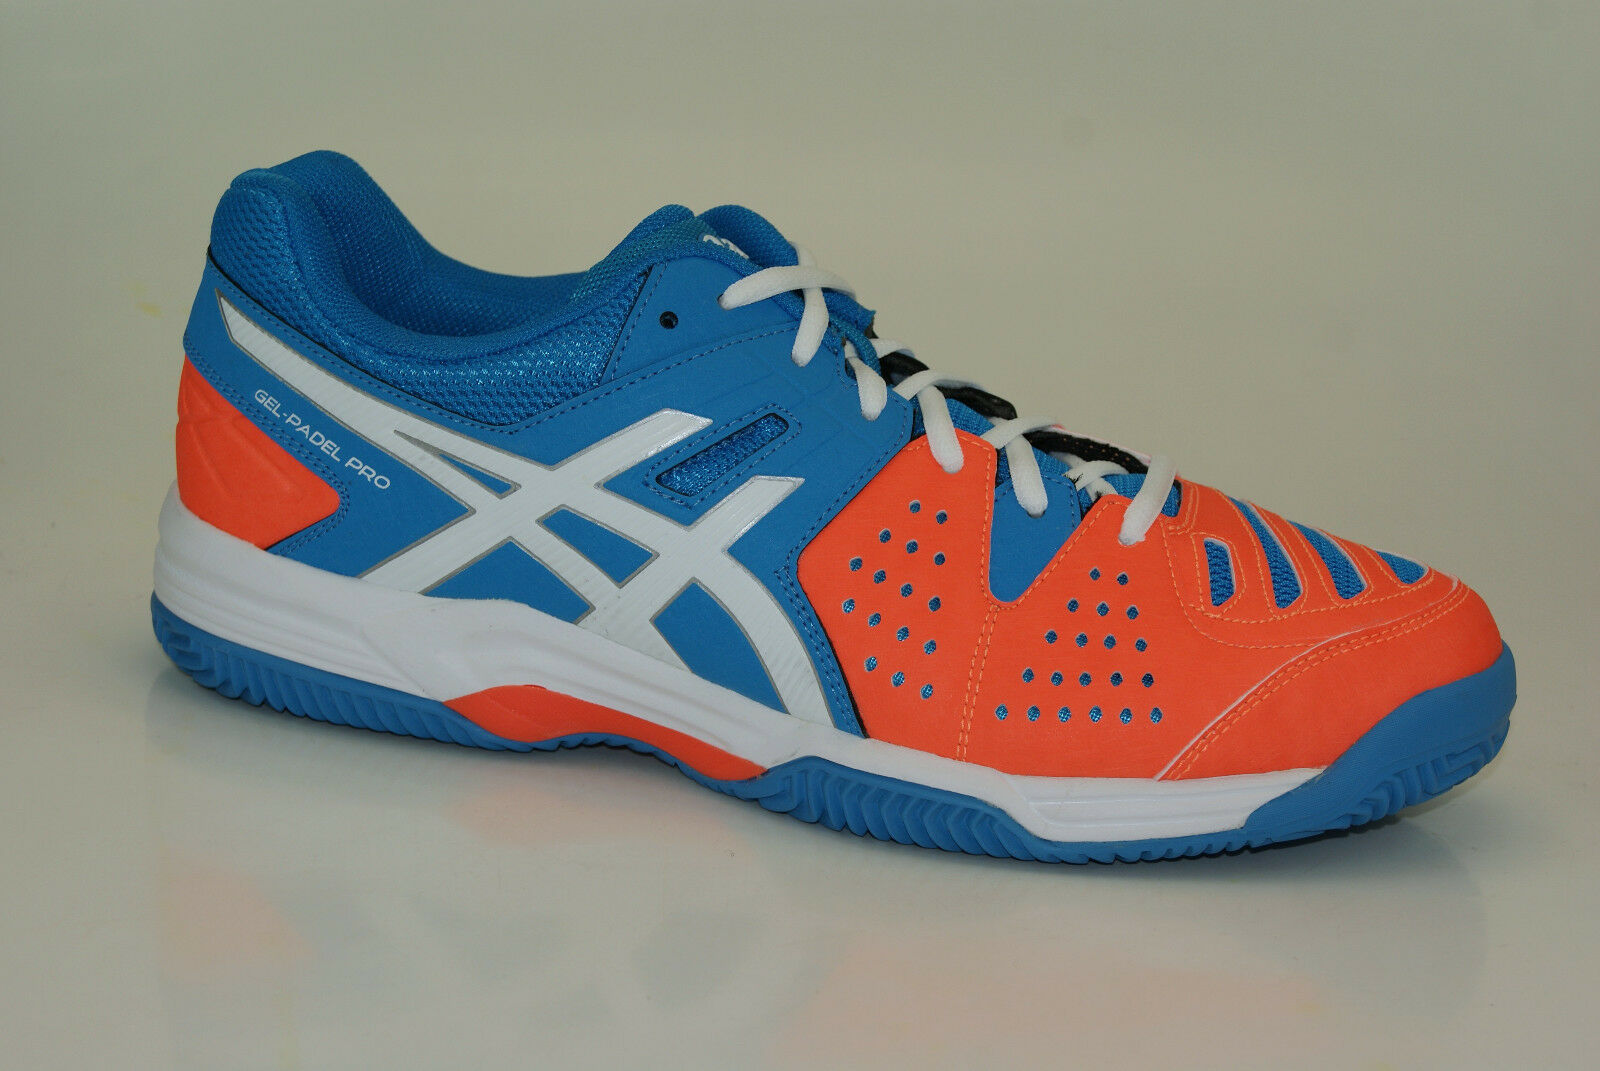 Asics Gel-Paddle pro 3 Sg Padelschuhe Sport shoes Trainers Men's E511y-4301